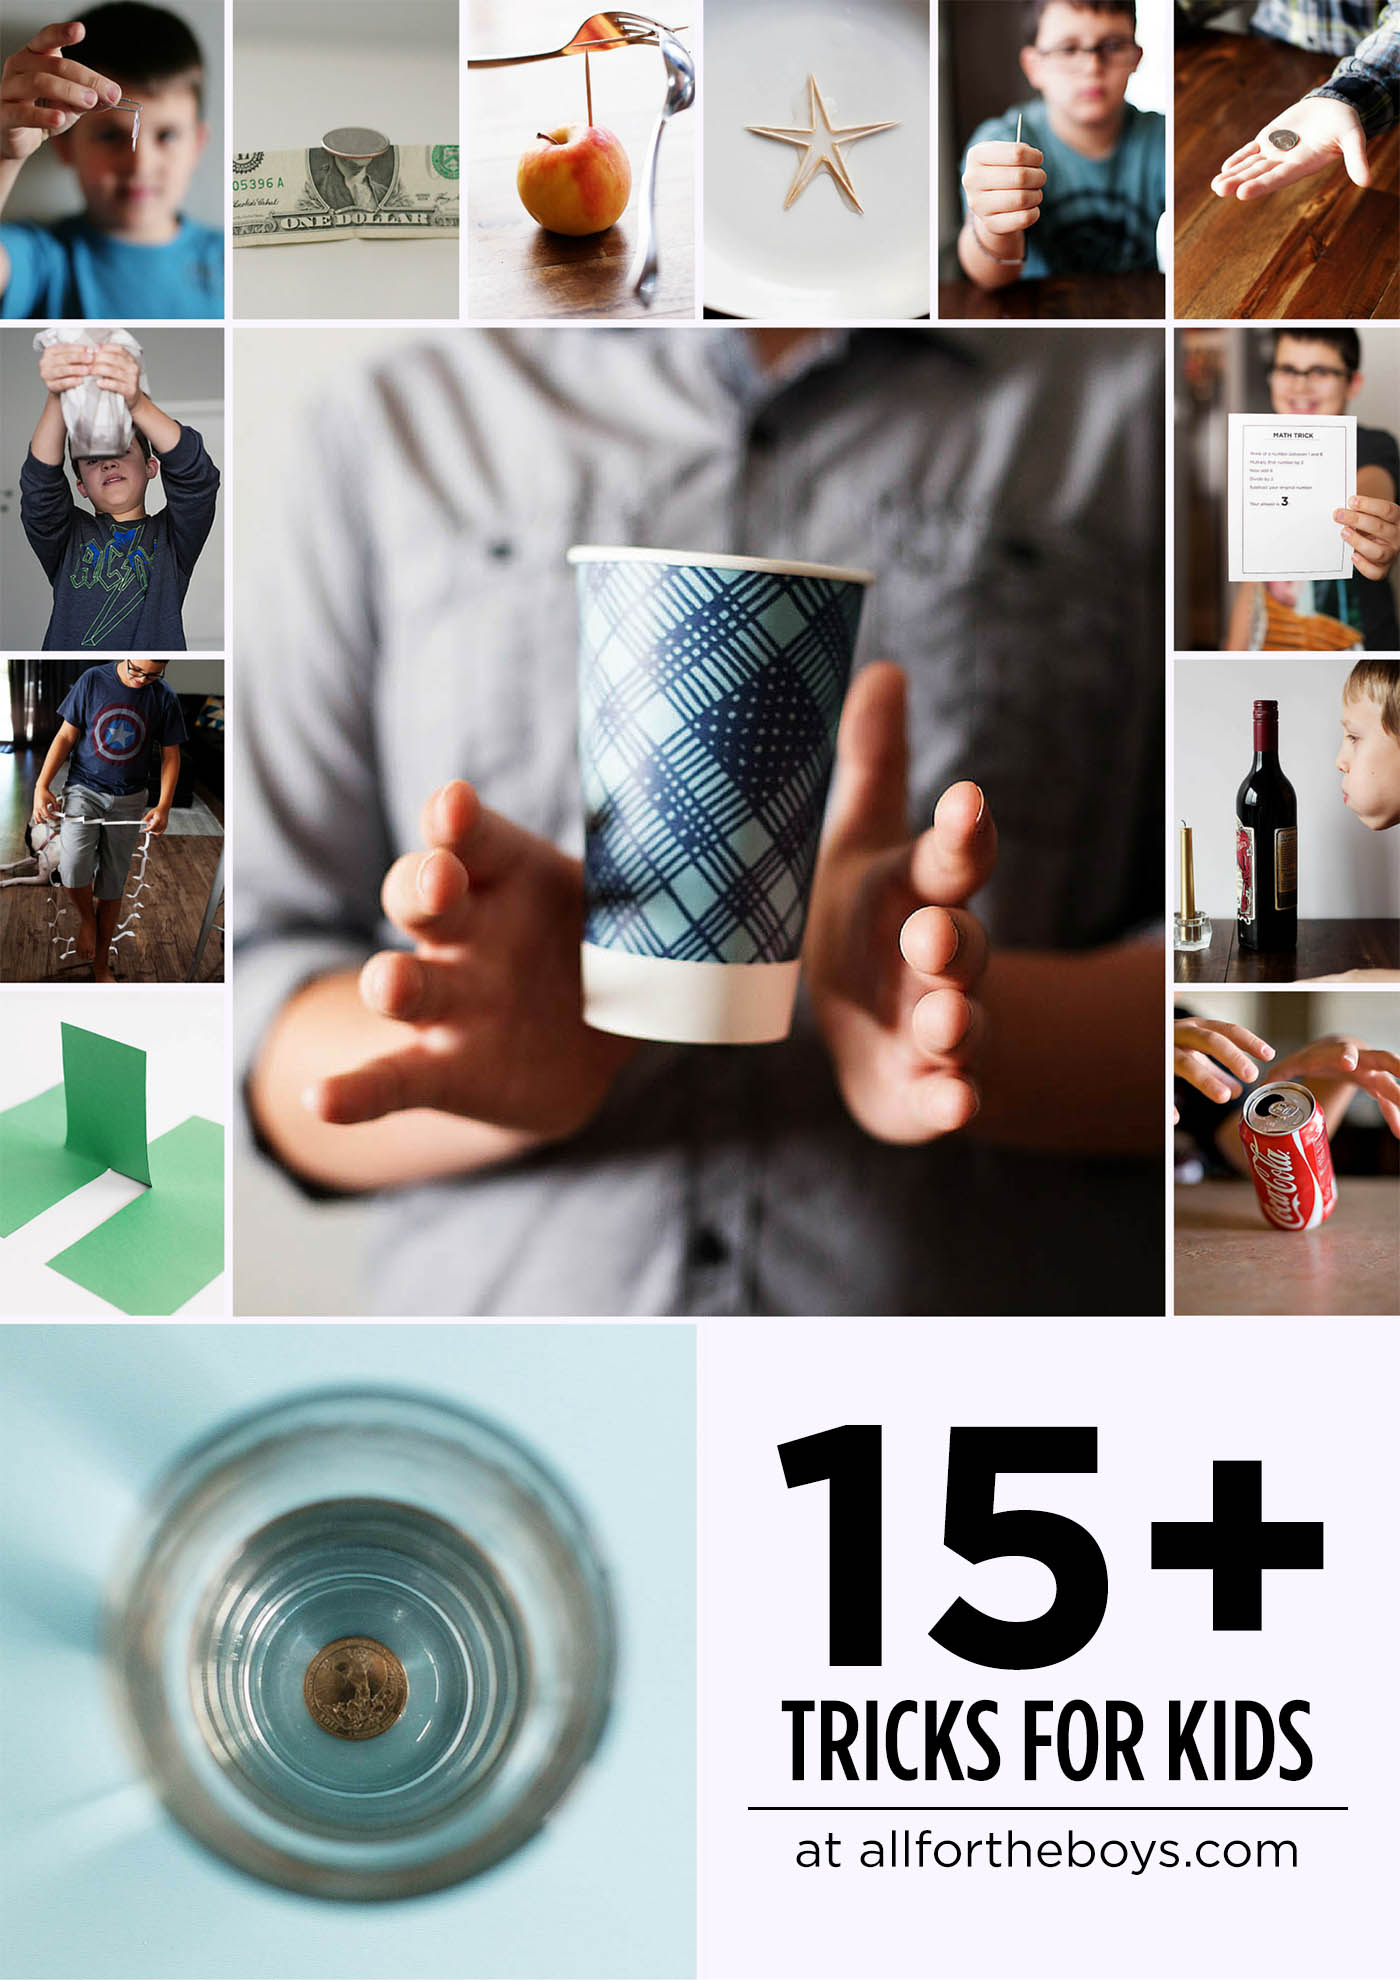 15+ fun tricks for kids to learn!